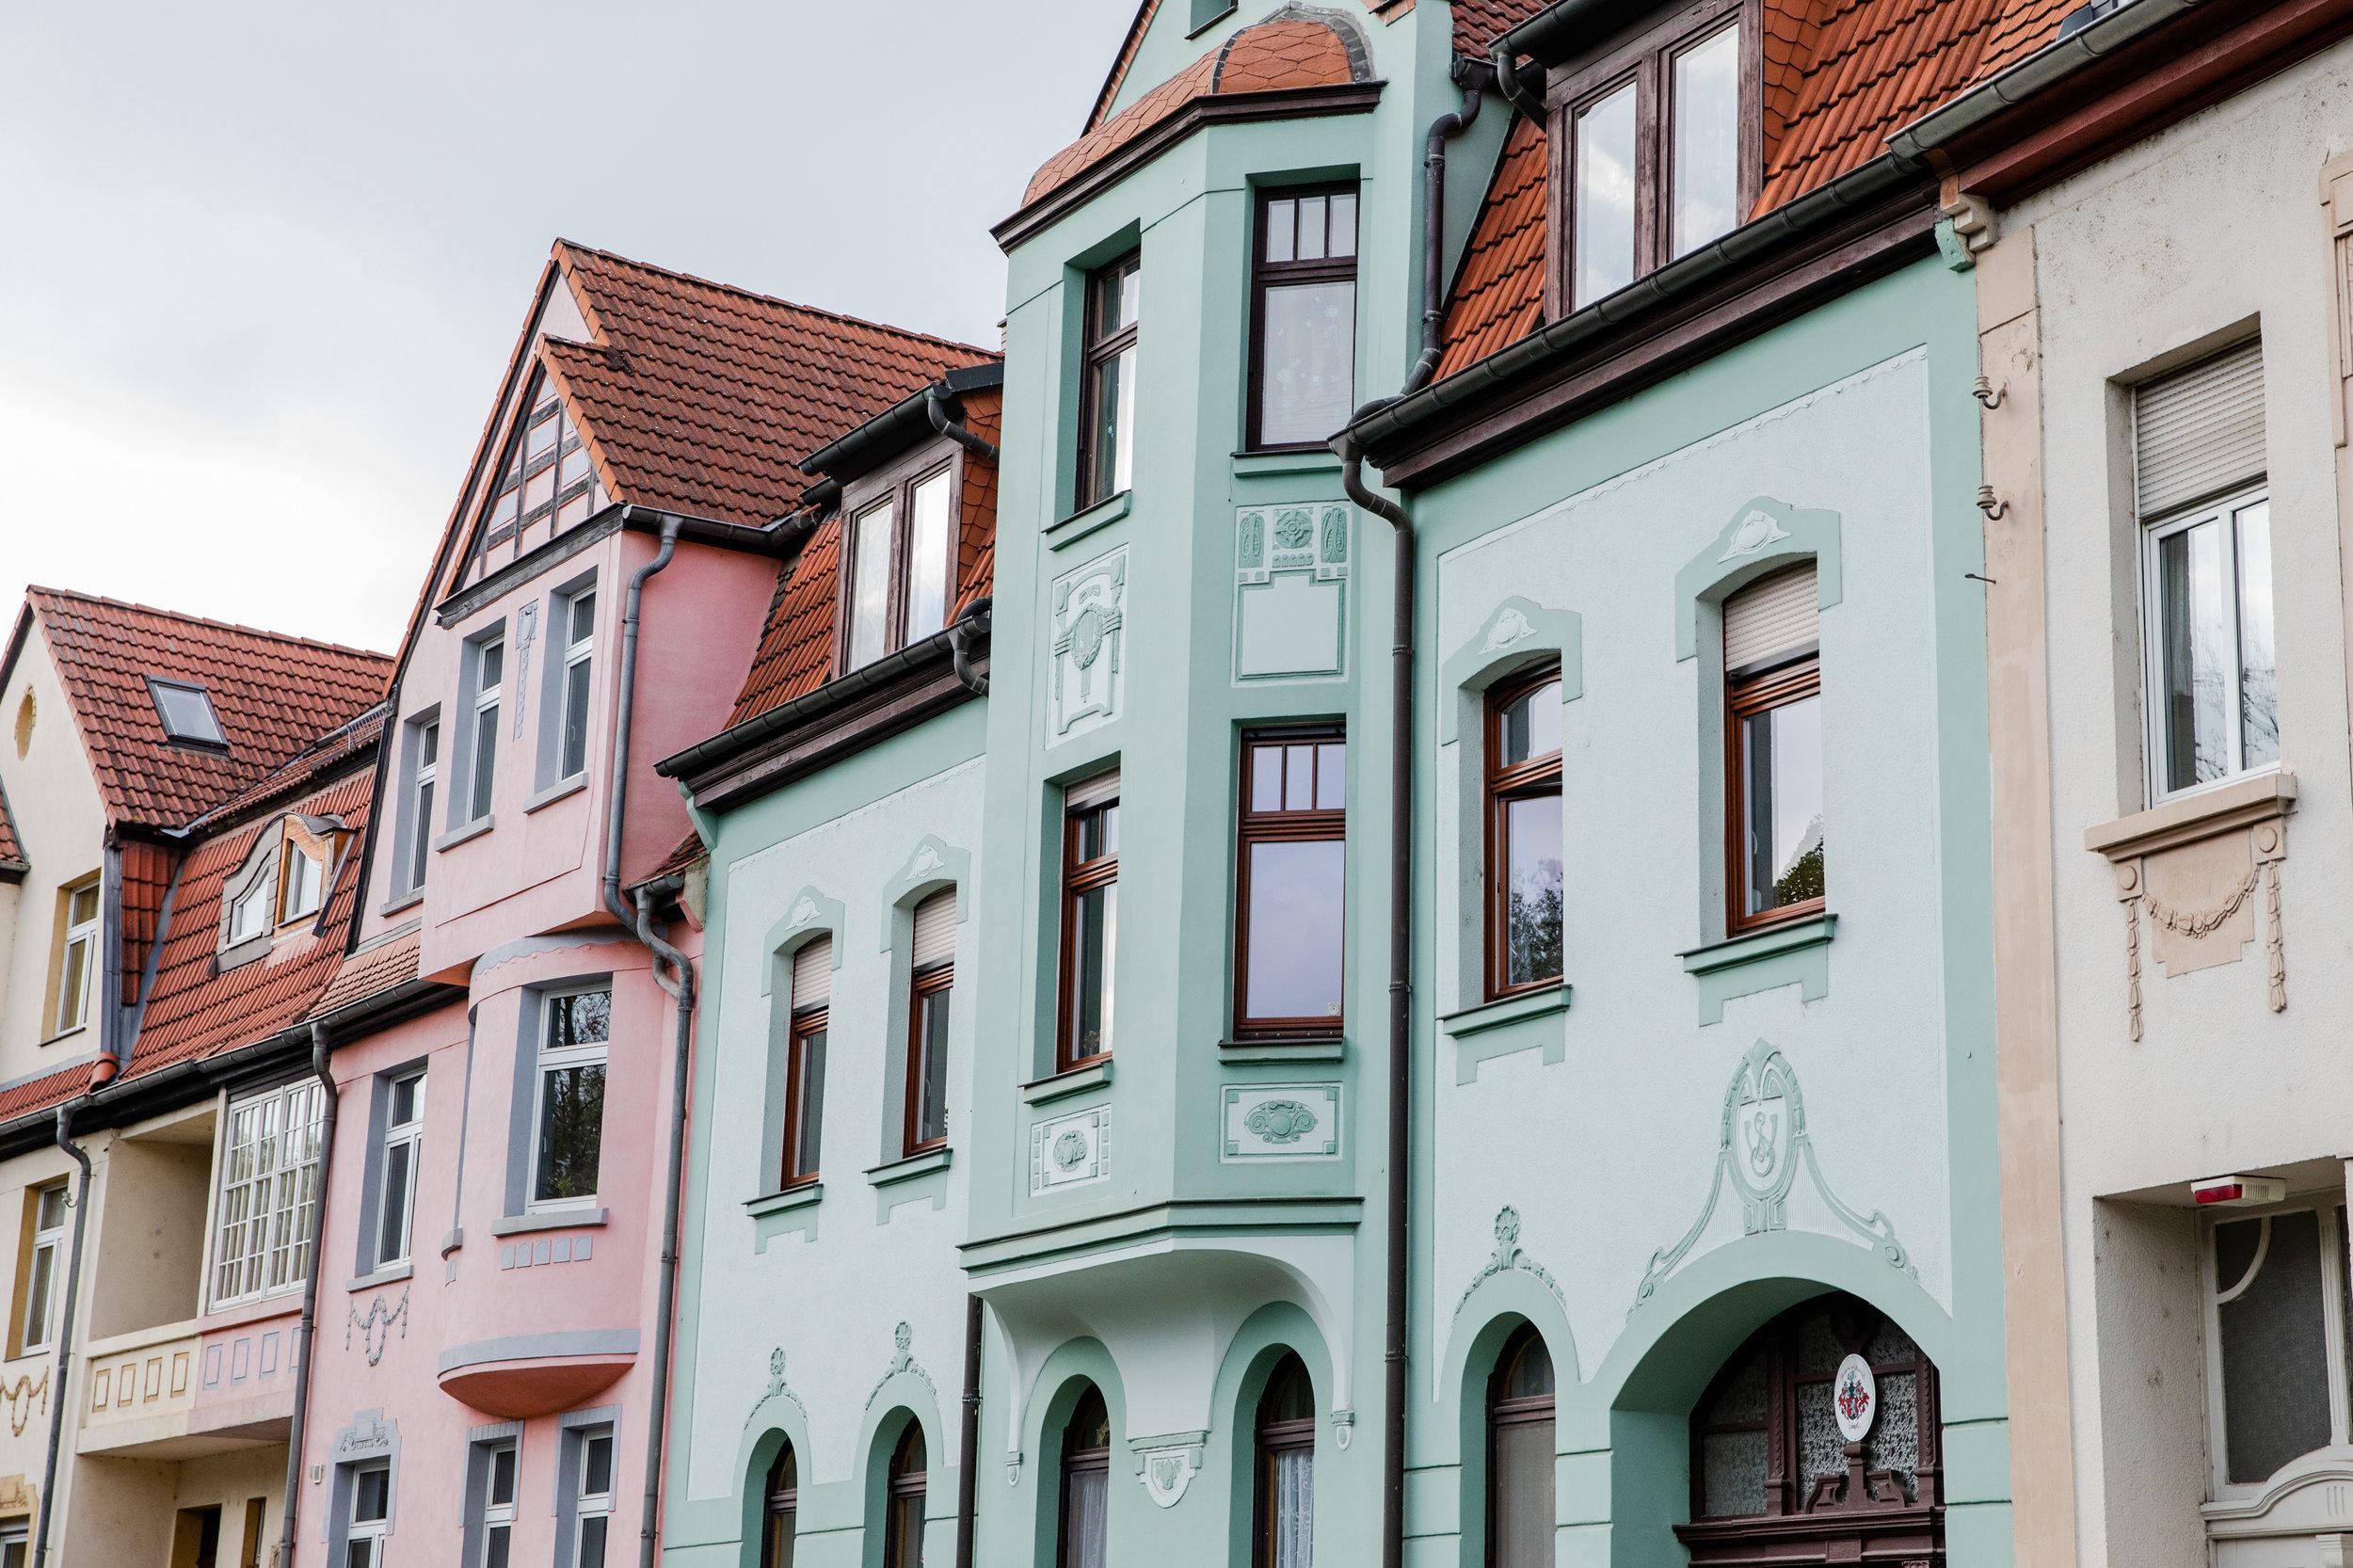 Germany-9136.jpg